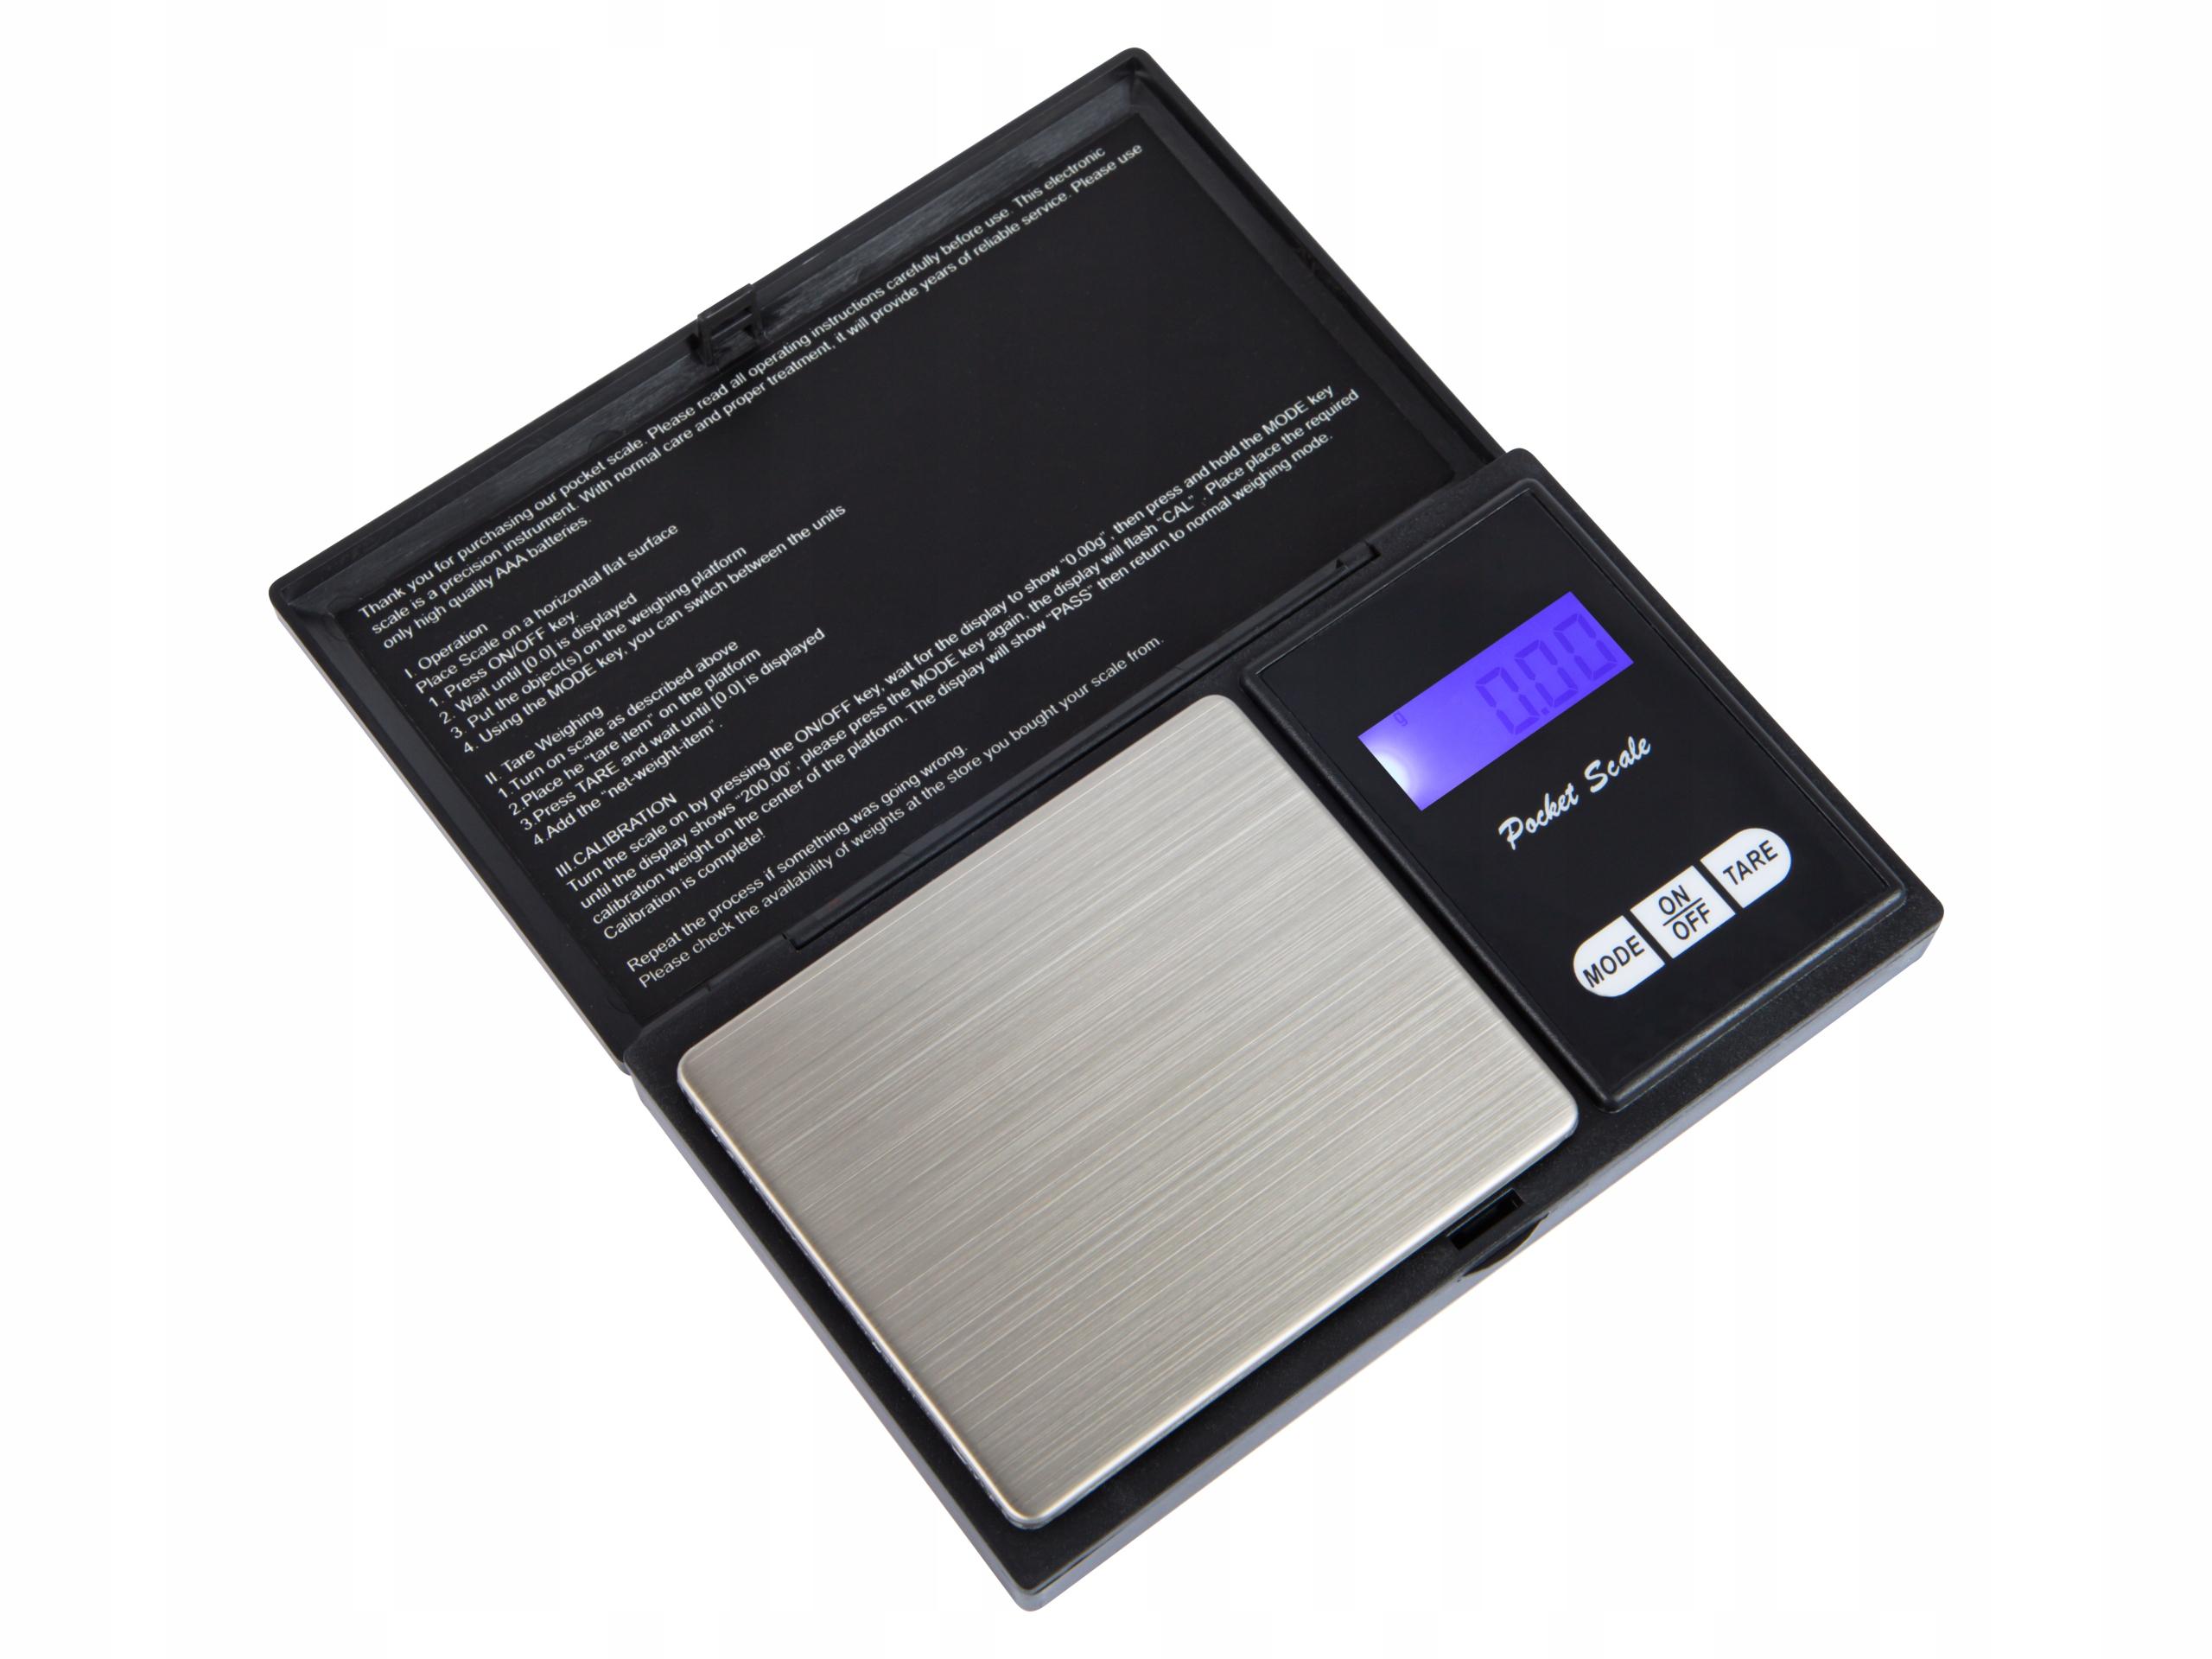 Precyzyjna waga jubilerska Blow cyfrowa LCD 500g